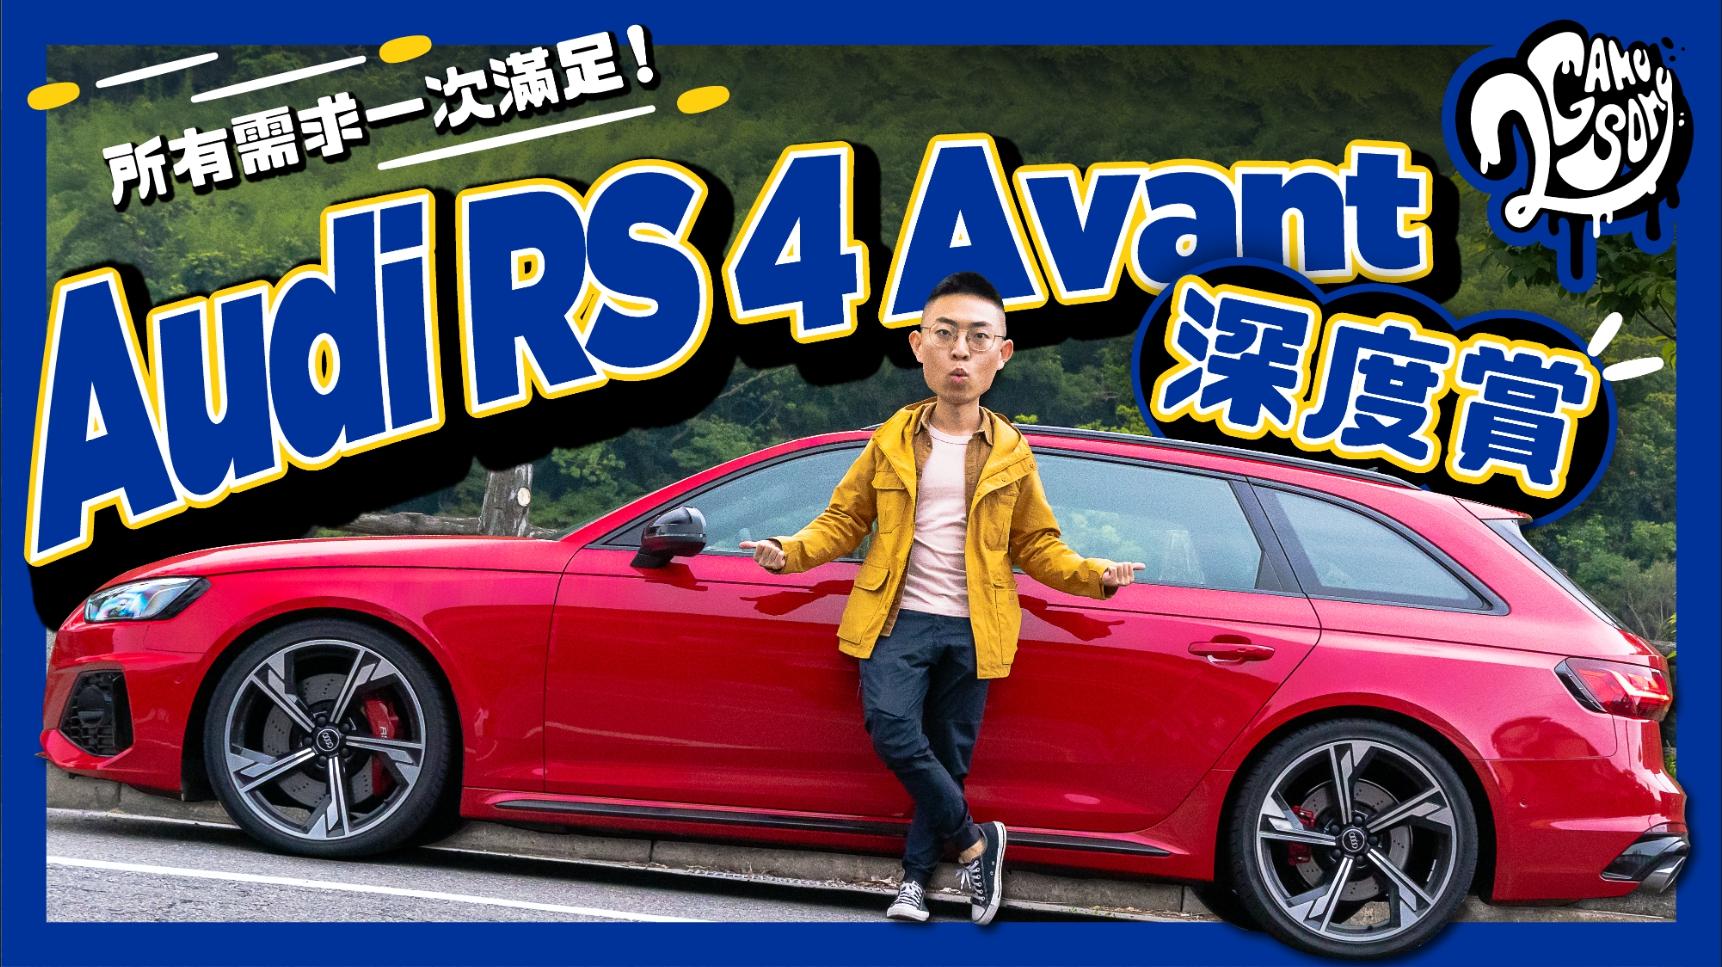 Audi RS 4 Avant 深度賞|所有需求一次滿足!